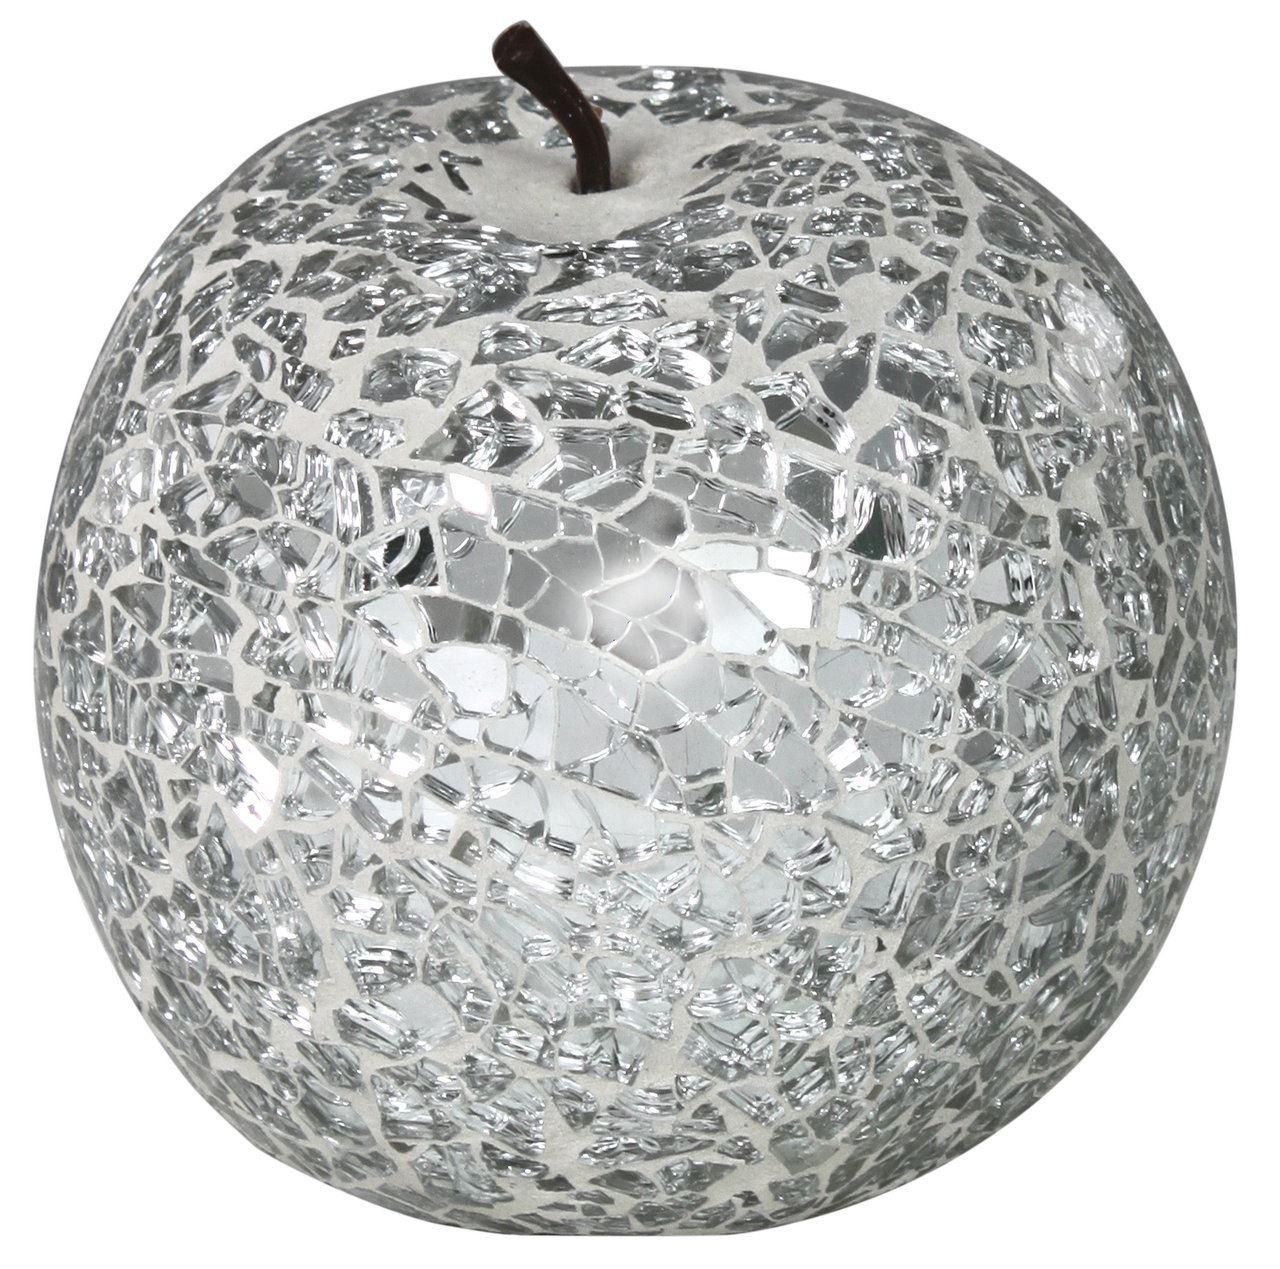 Silver Sparkle Mosaic Apple Decoration With Stem